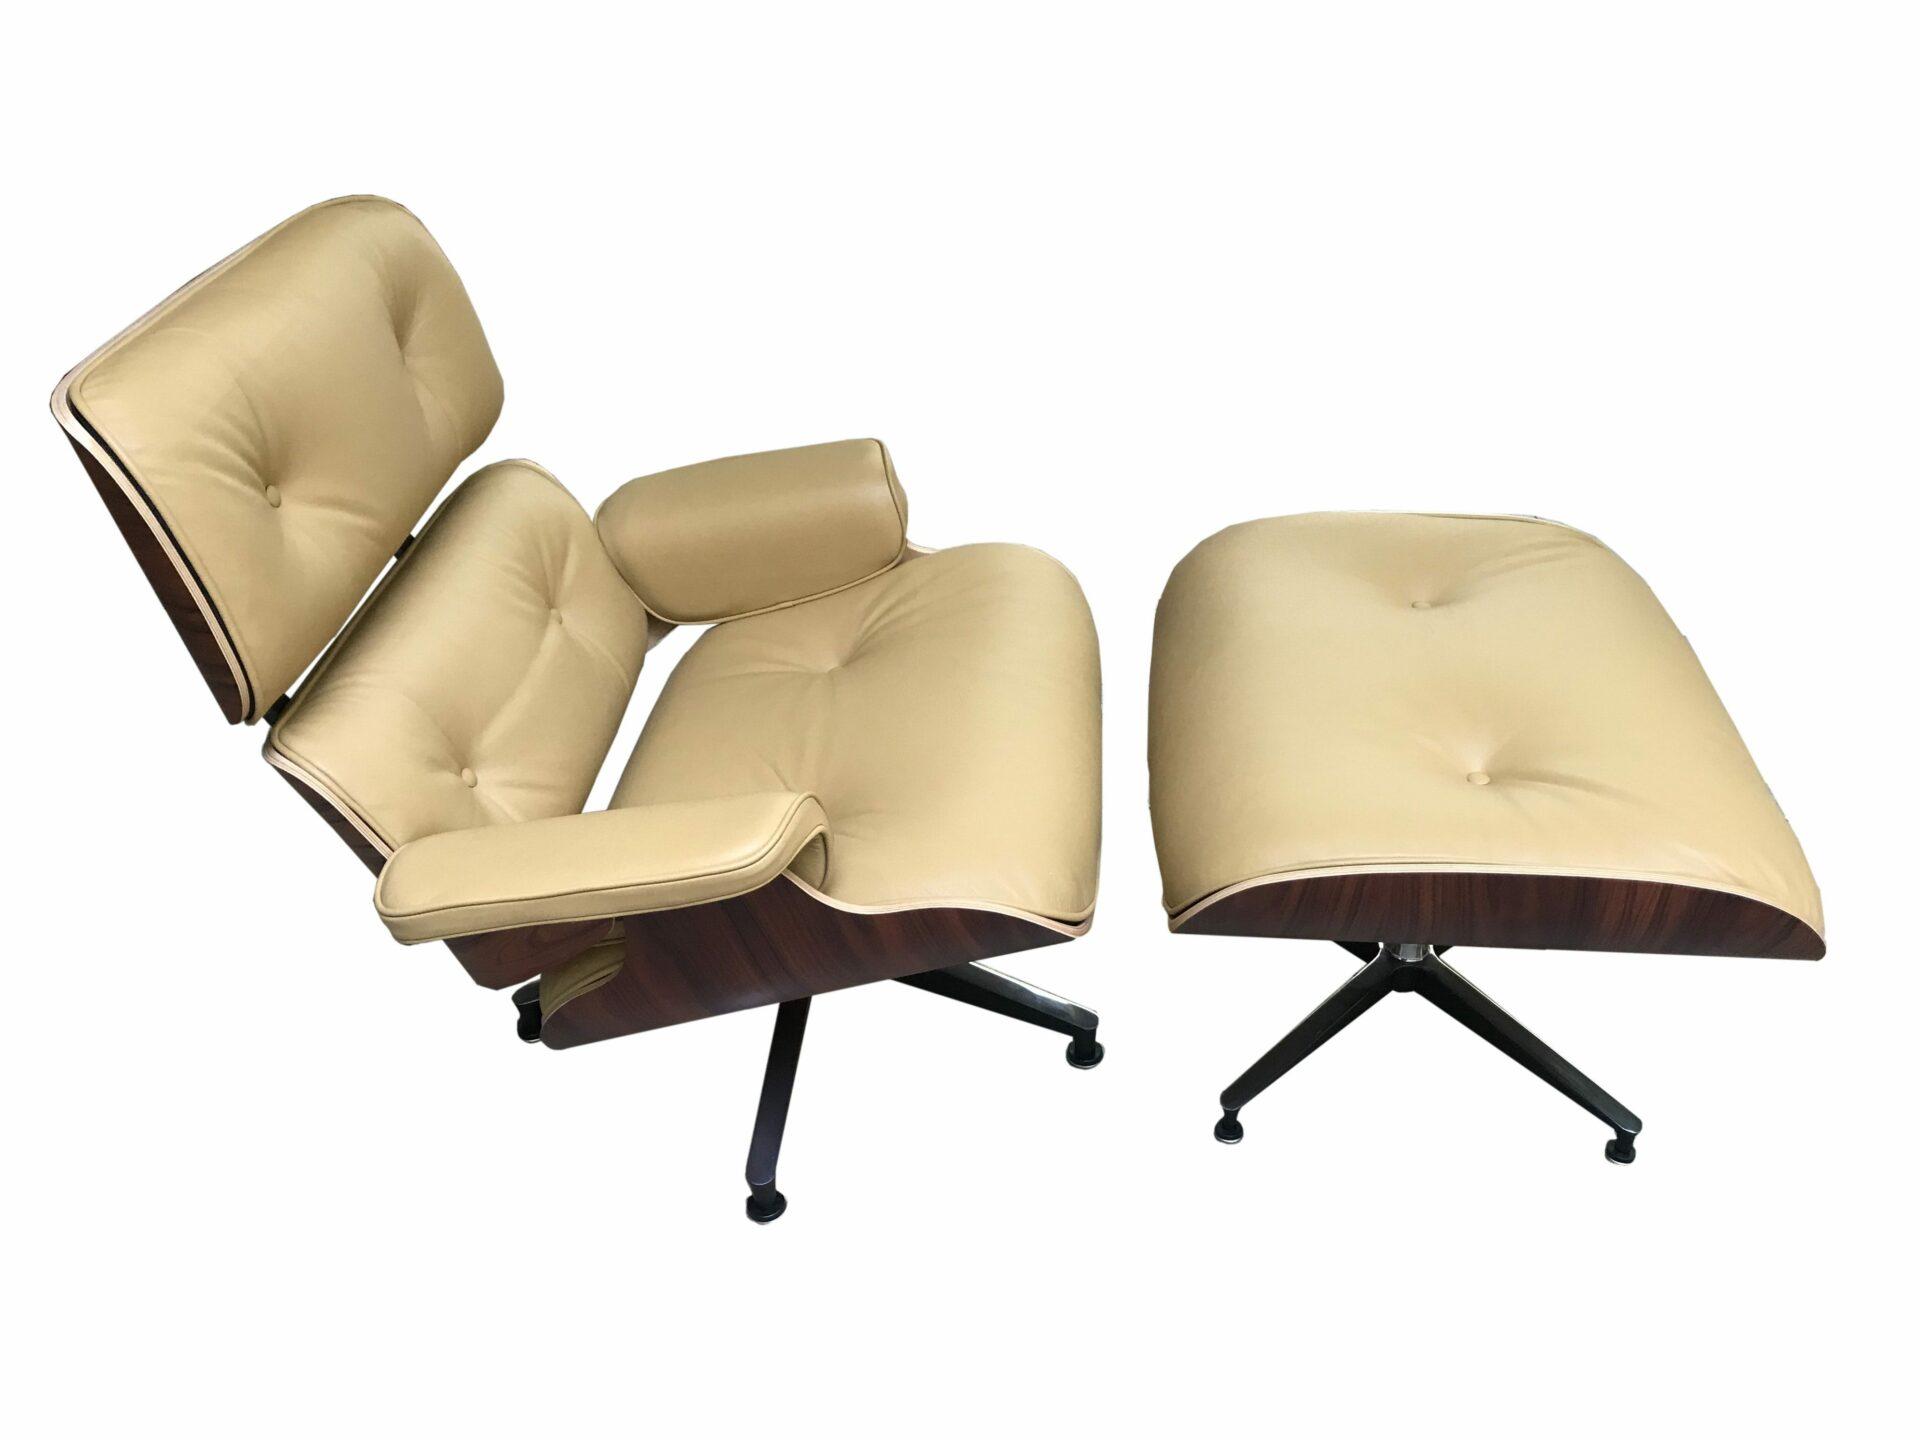 eames loungesessel herman miller edition gebraucht